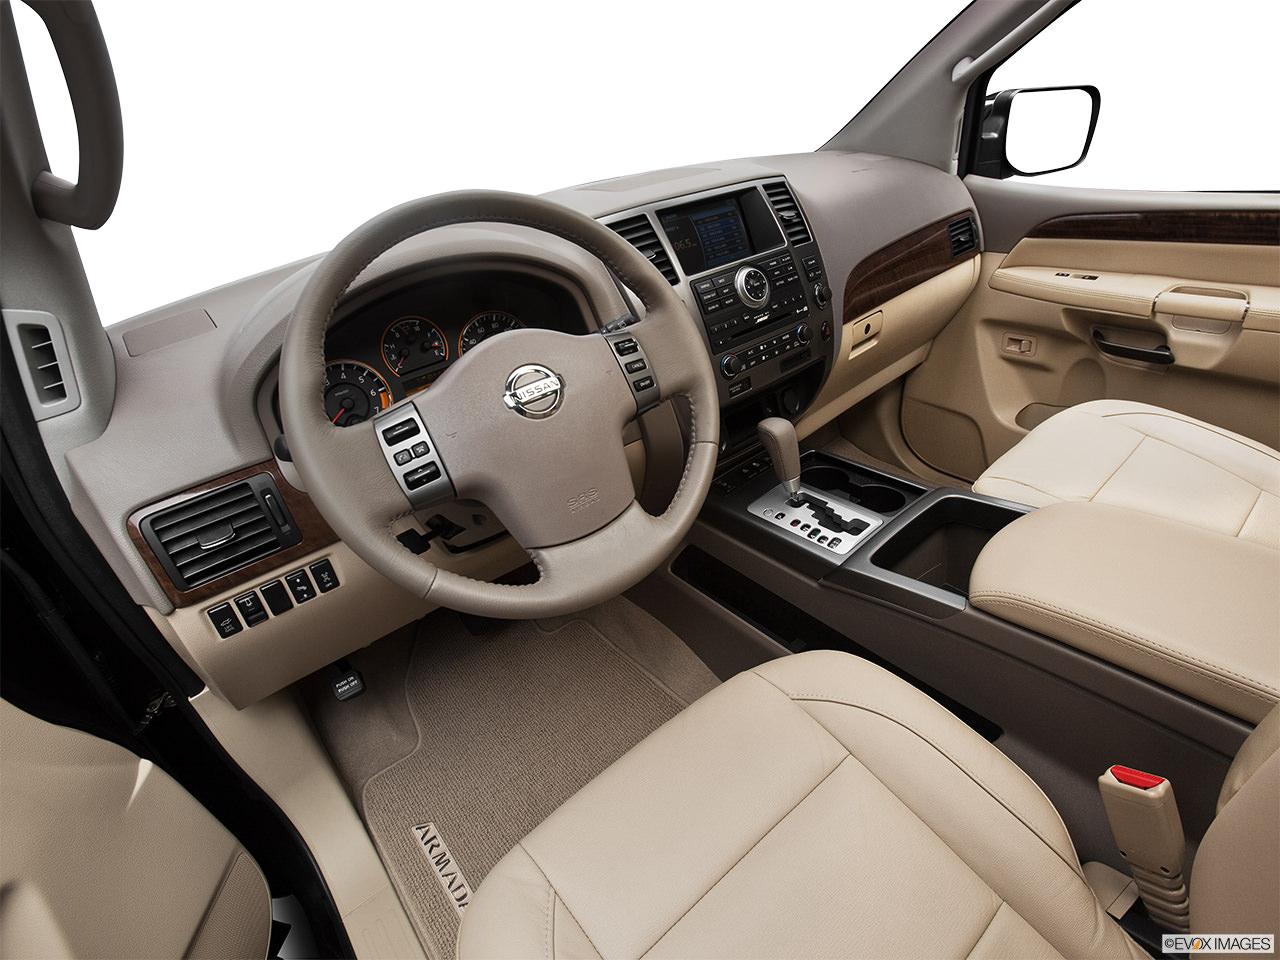 Nissan Armada 2012 interior